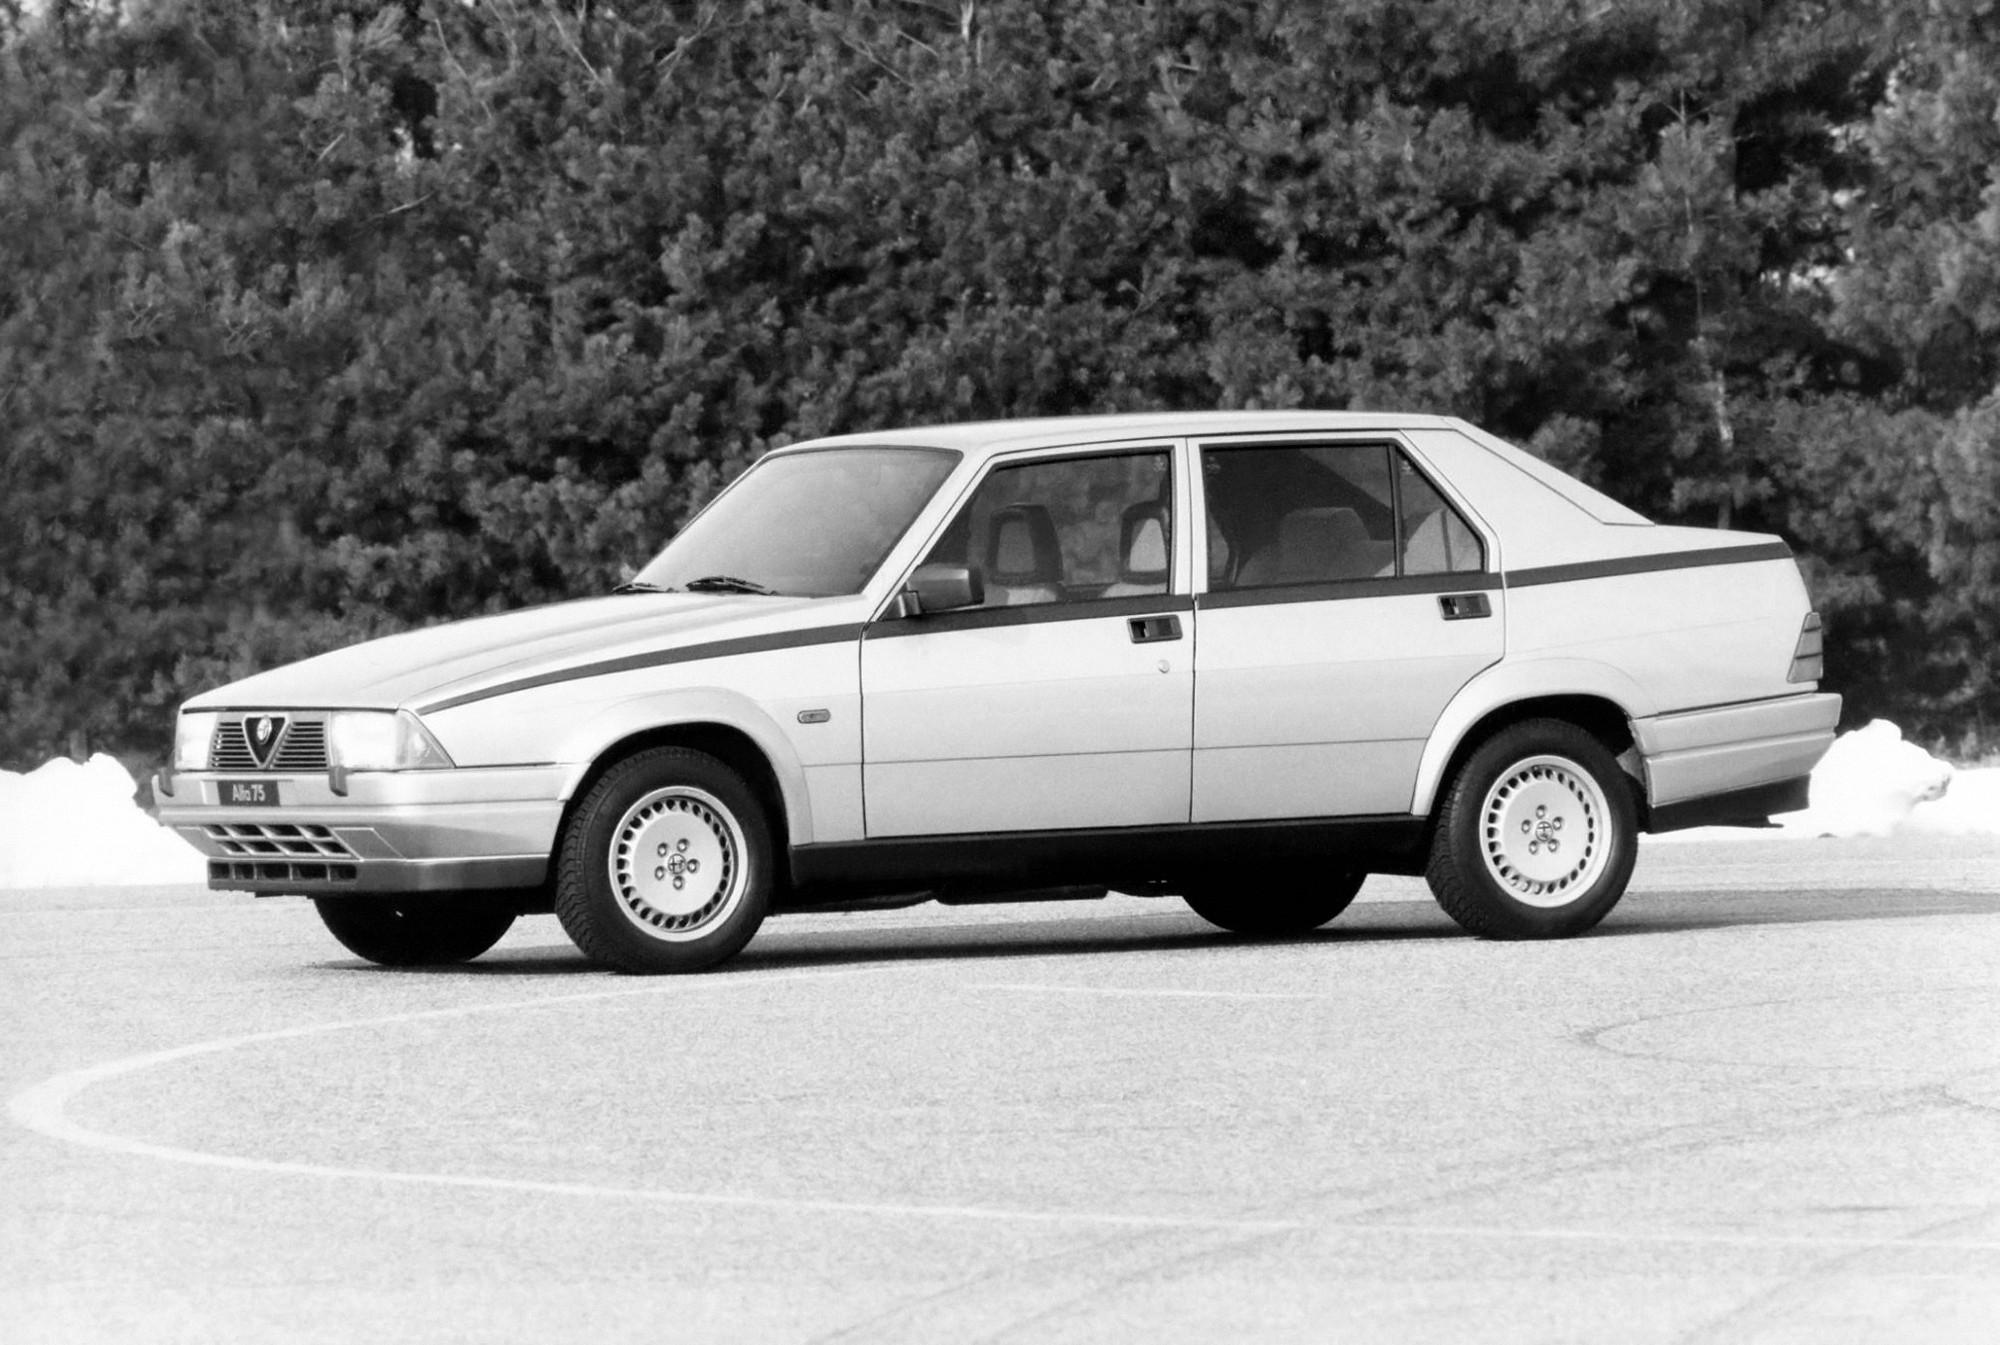 alfa romeo 75 specs \u0026 photos 1985, 1986, 1987, 1988, 1989, 1990Alfa Romeo 75 Twin Spark Wiring Diagram #8